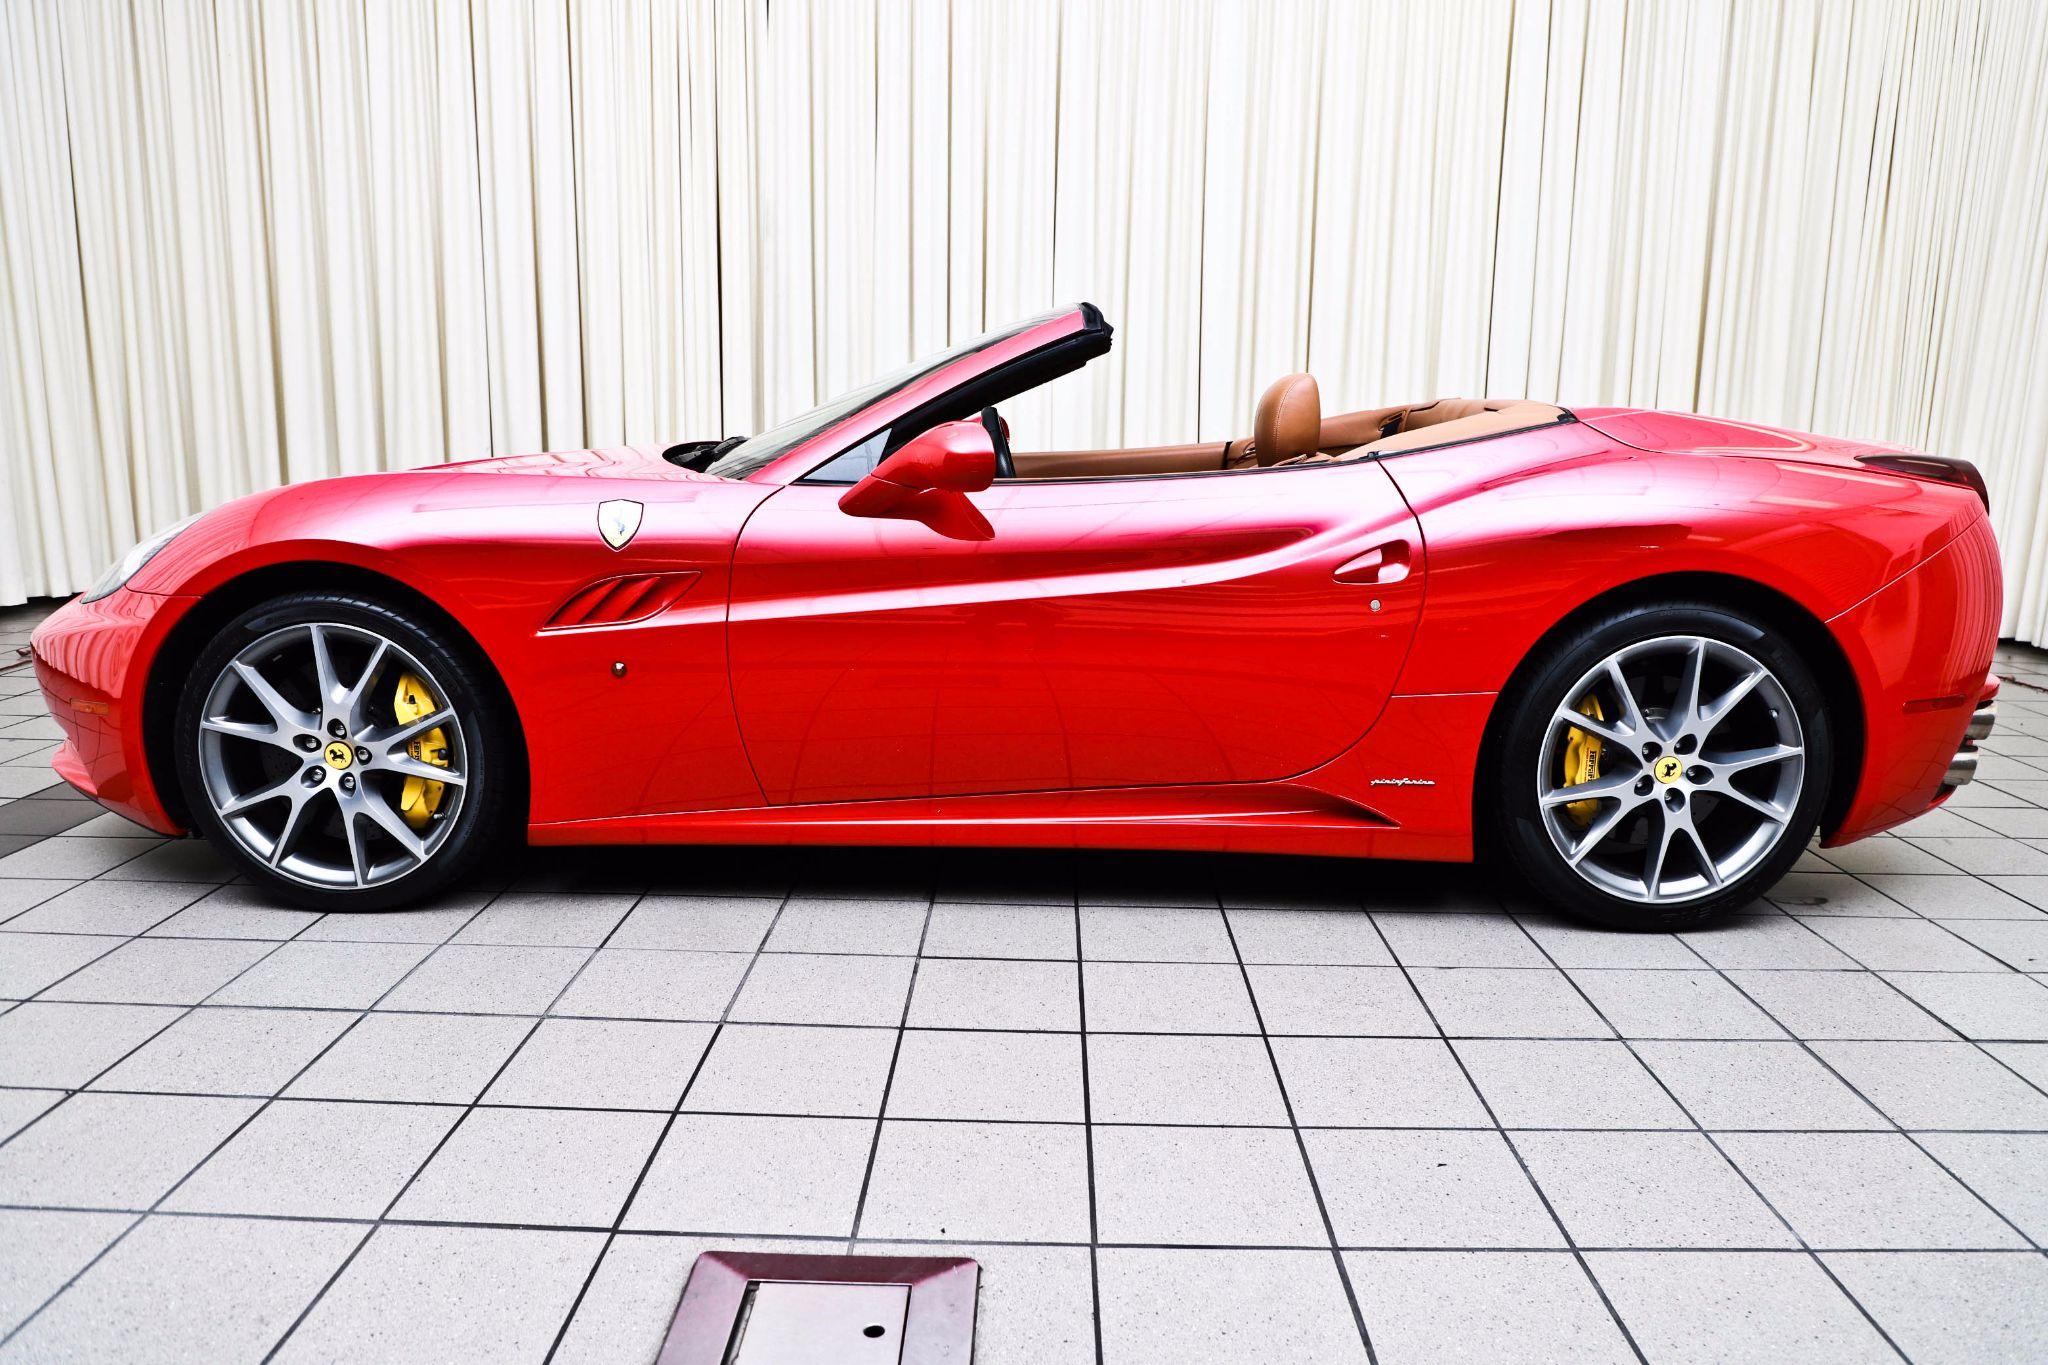 Ferrari for sale in Scottsdale, 2014 Ferrari California in ...